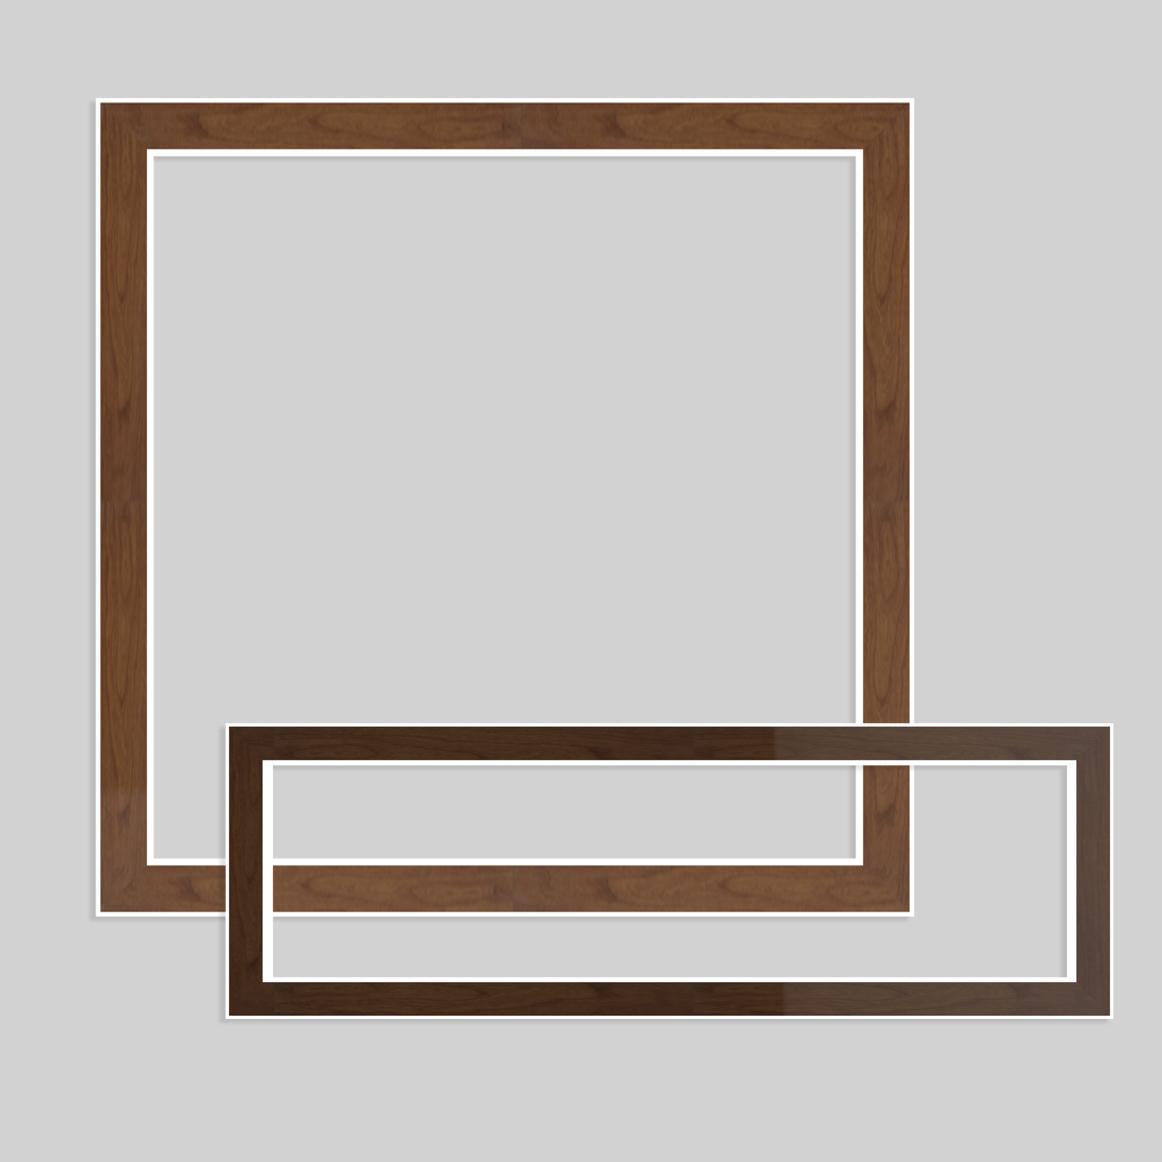 afb-betacalco-micro-quad-wood-de-wall-11551356722